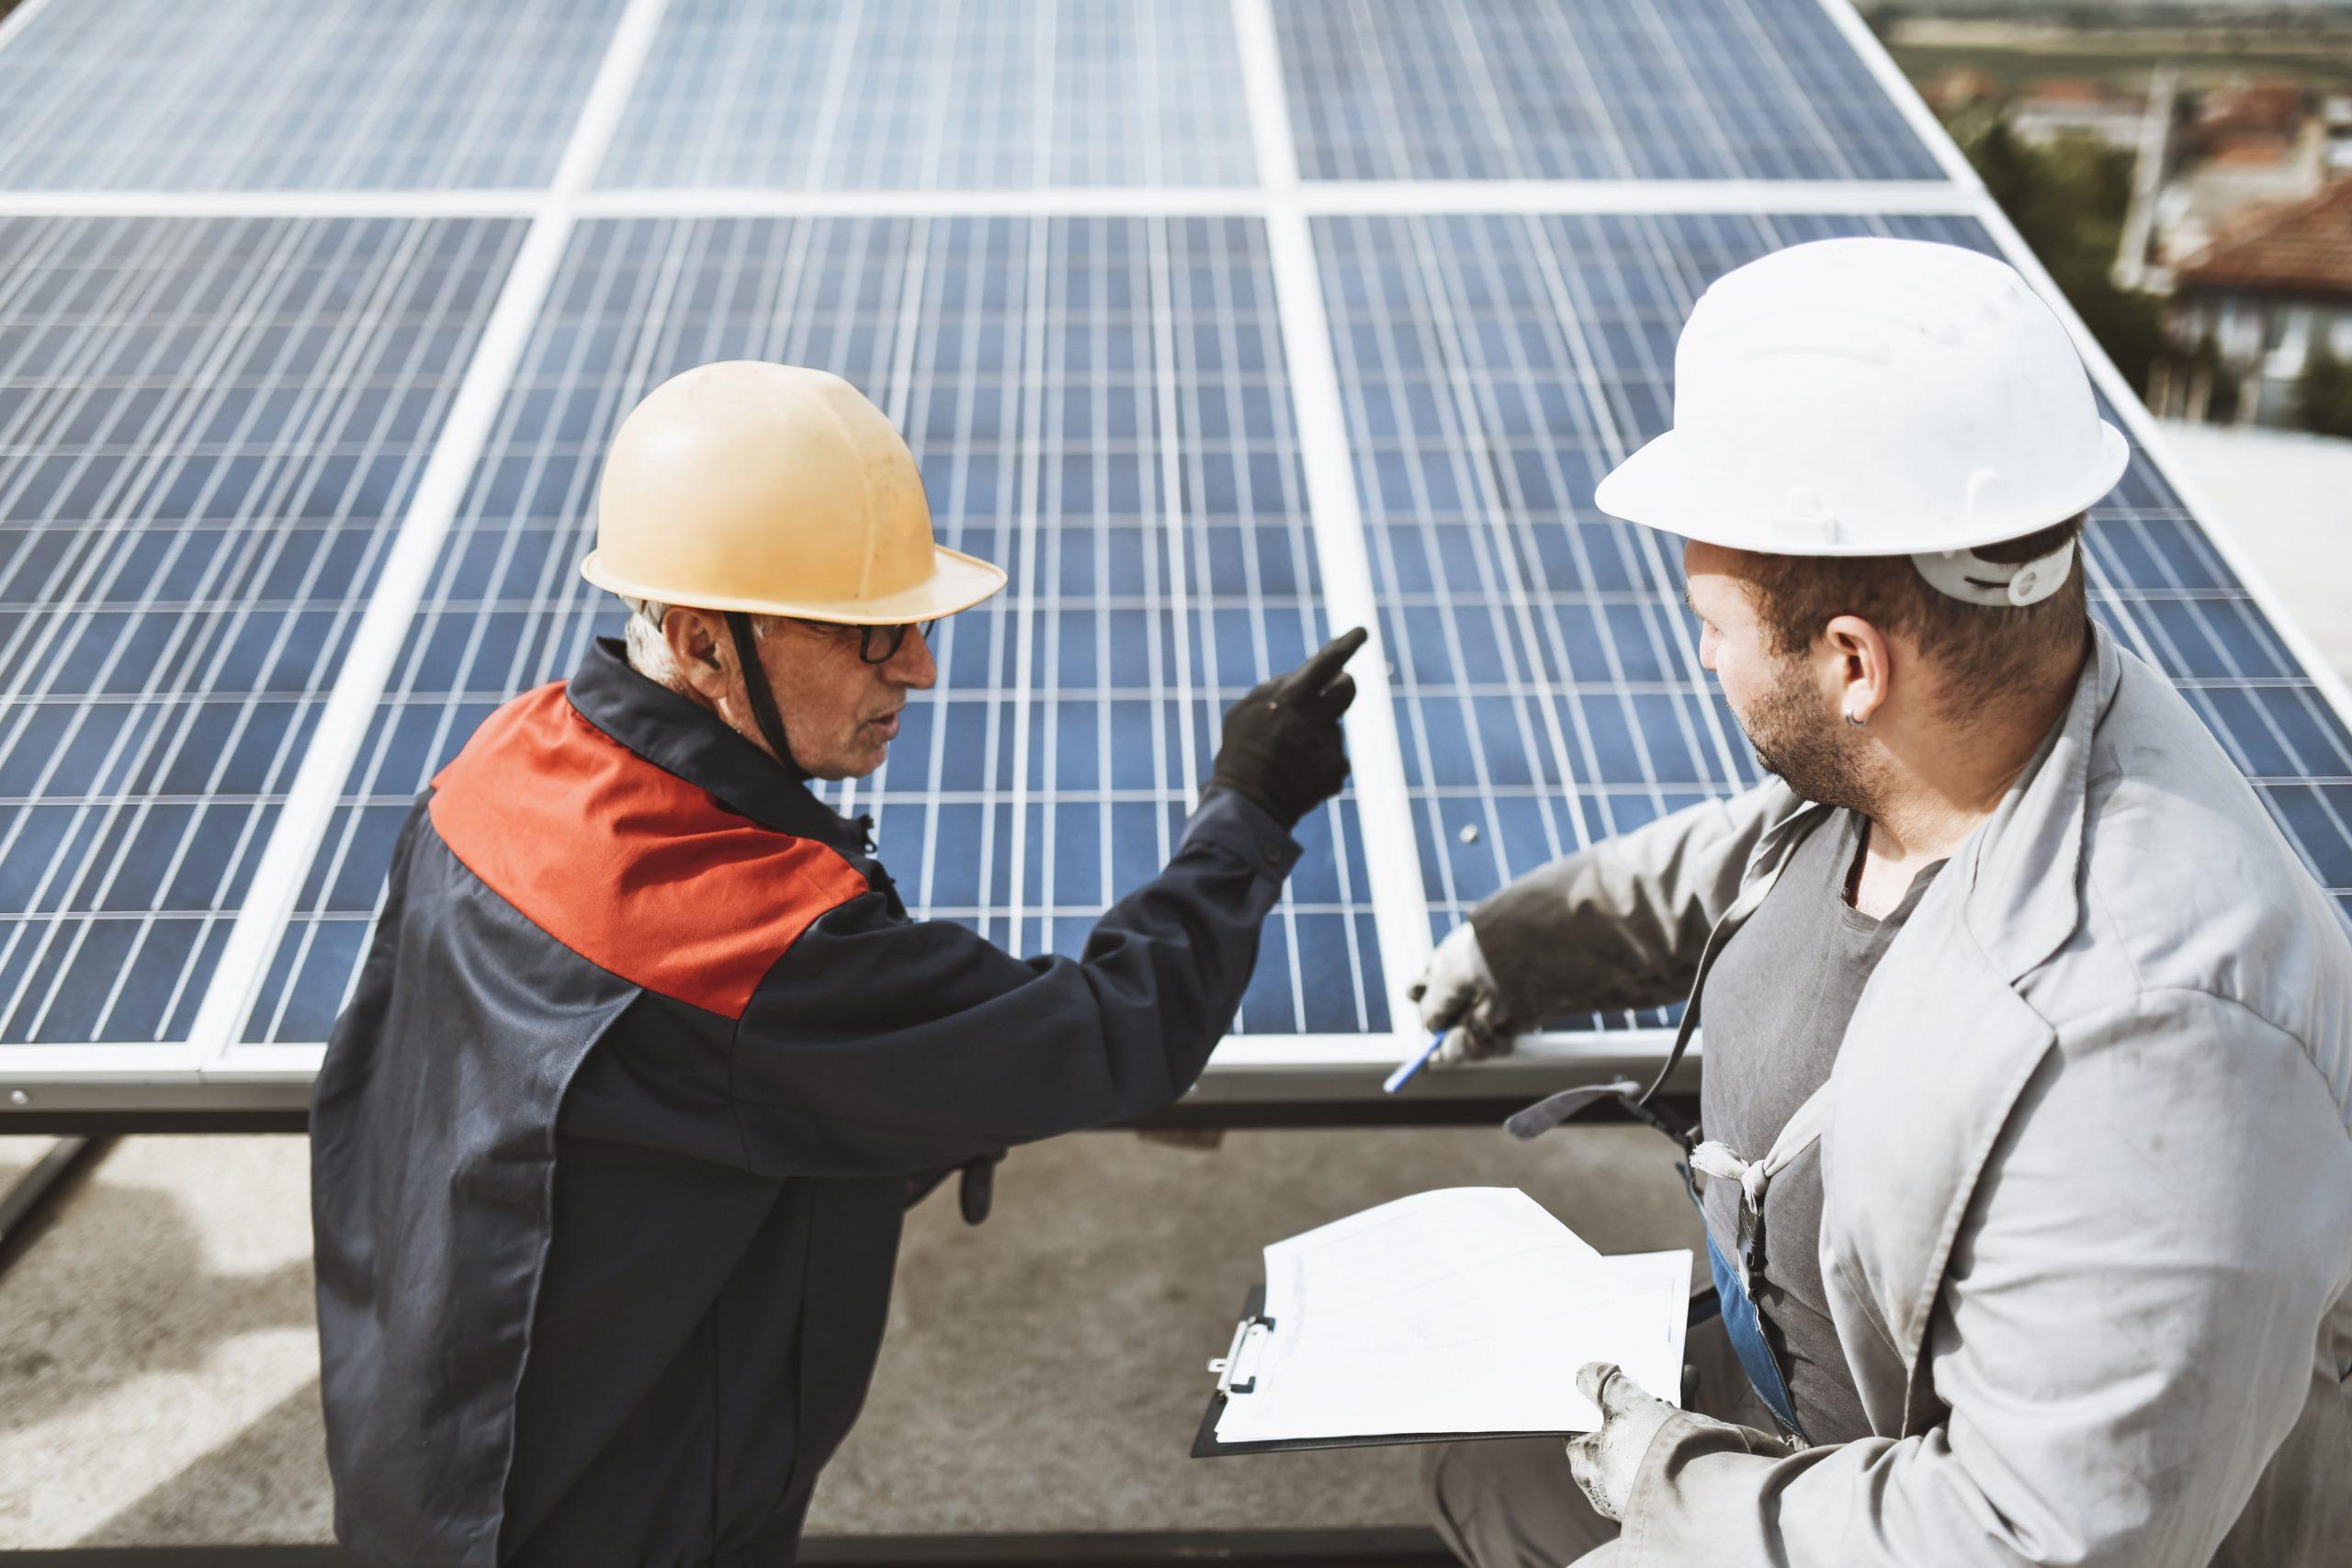 Men inspecting solar panels